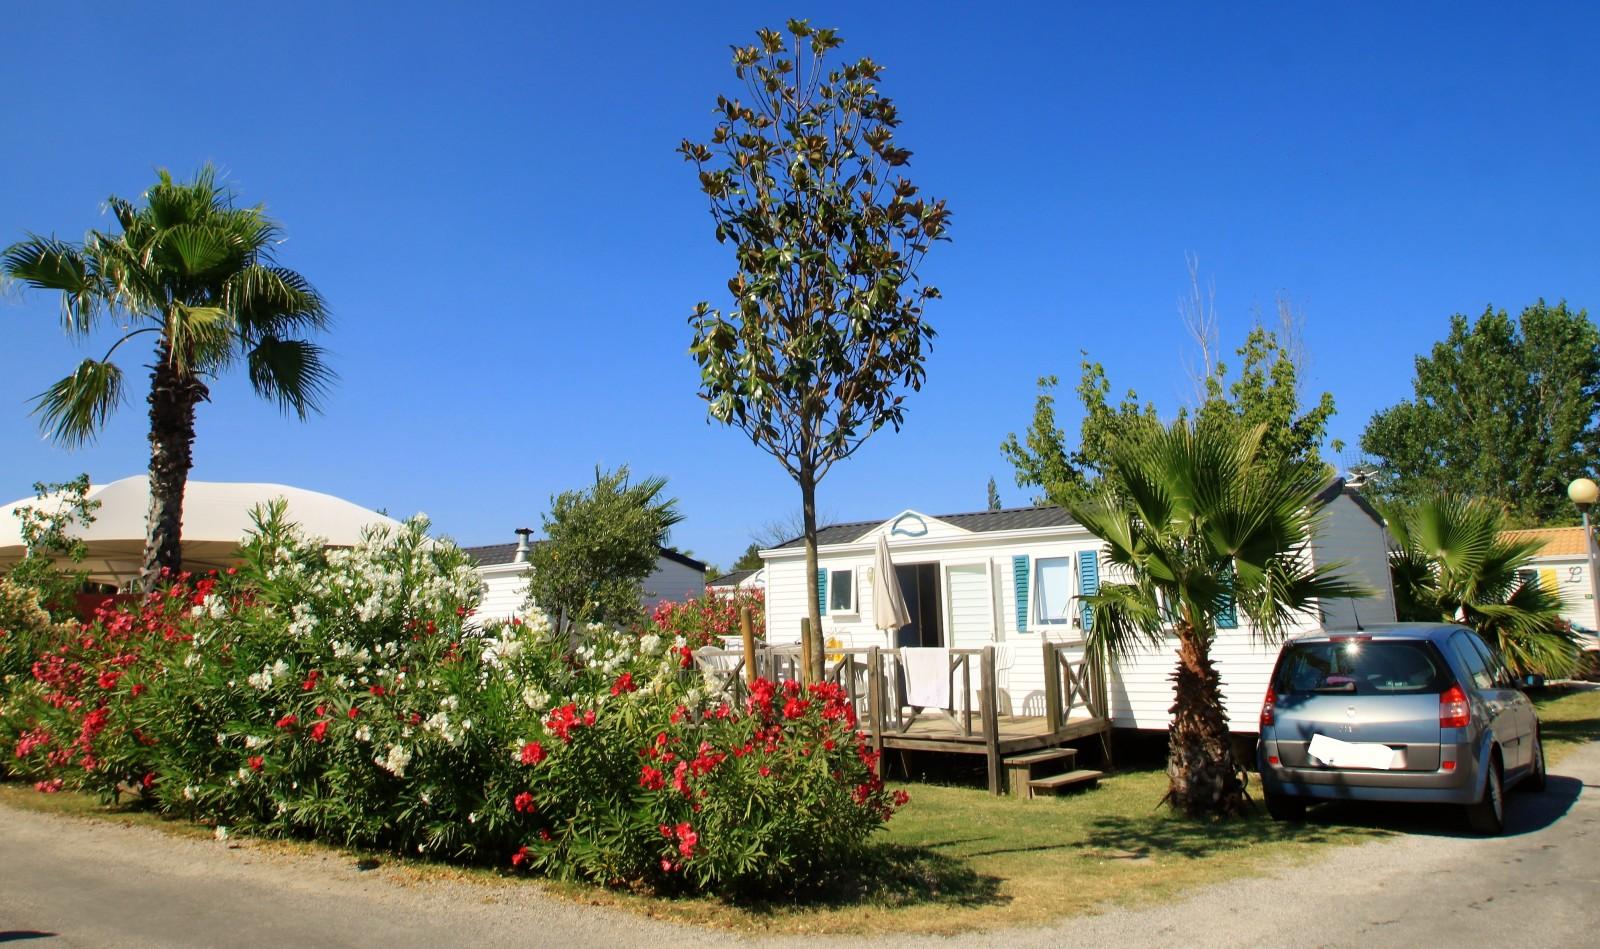 Camping Clos du Thym